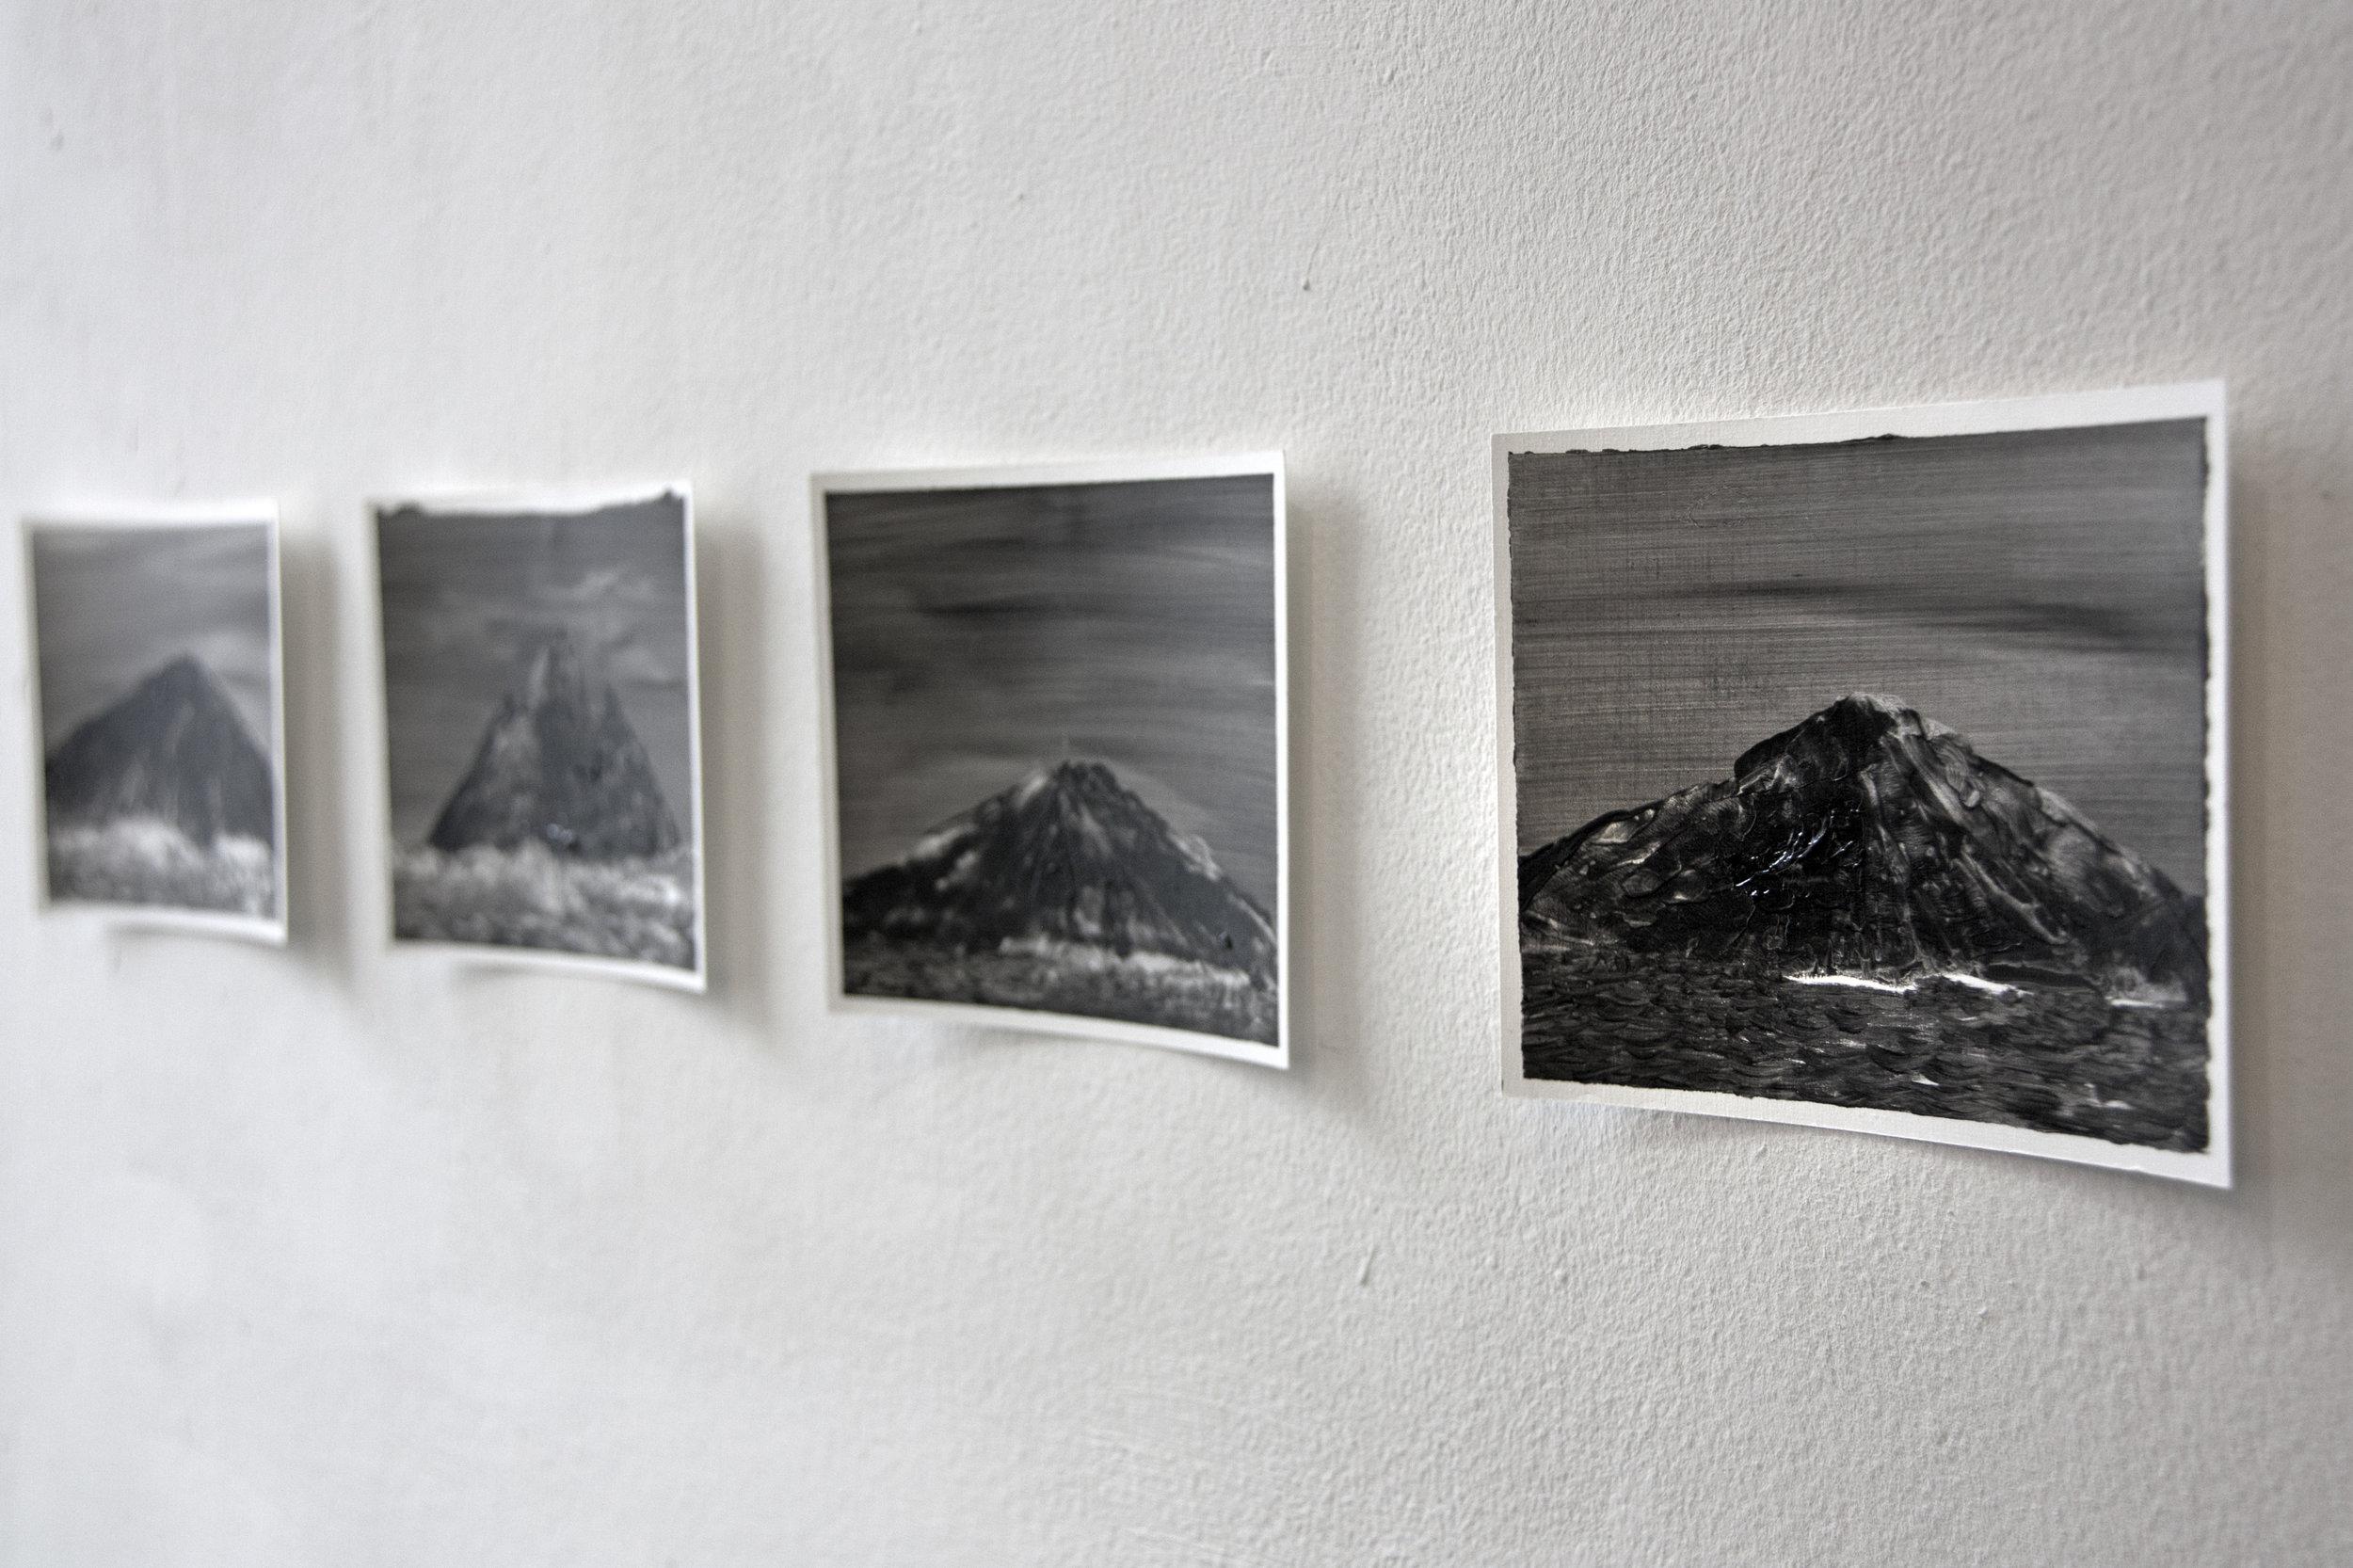 Dorota Borowa Lunar Eight Gallery